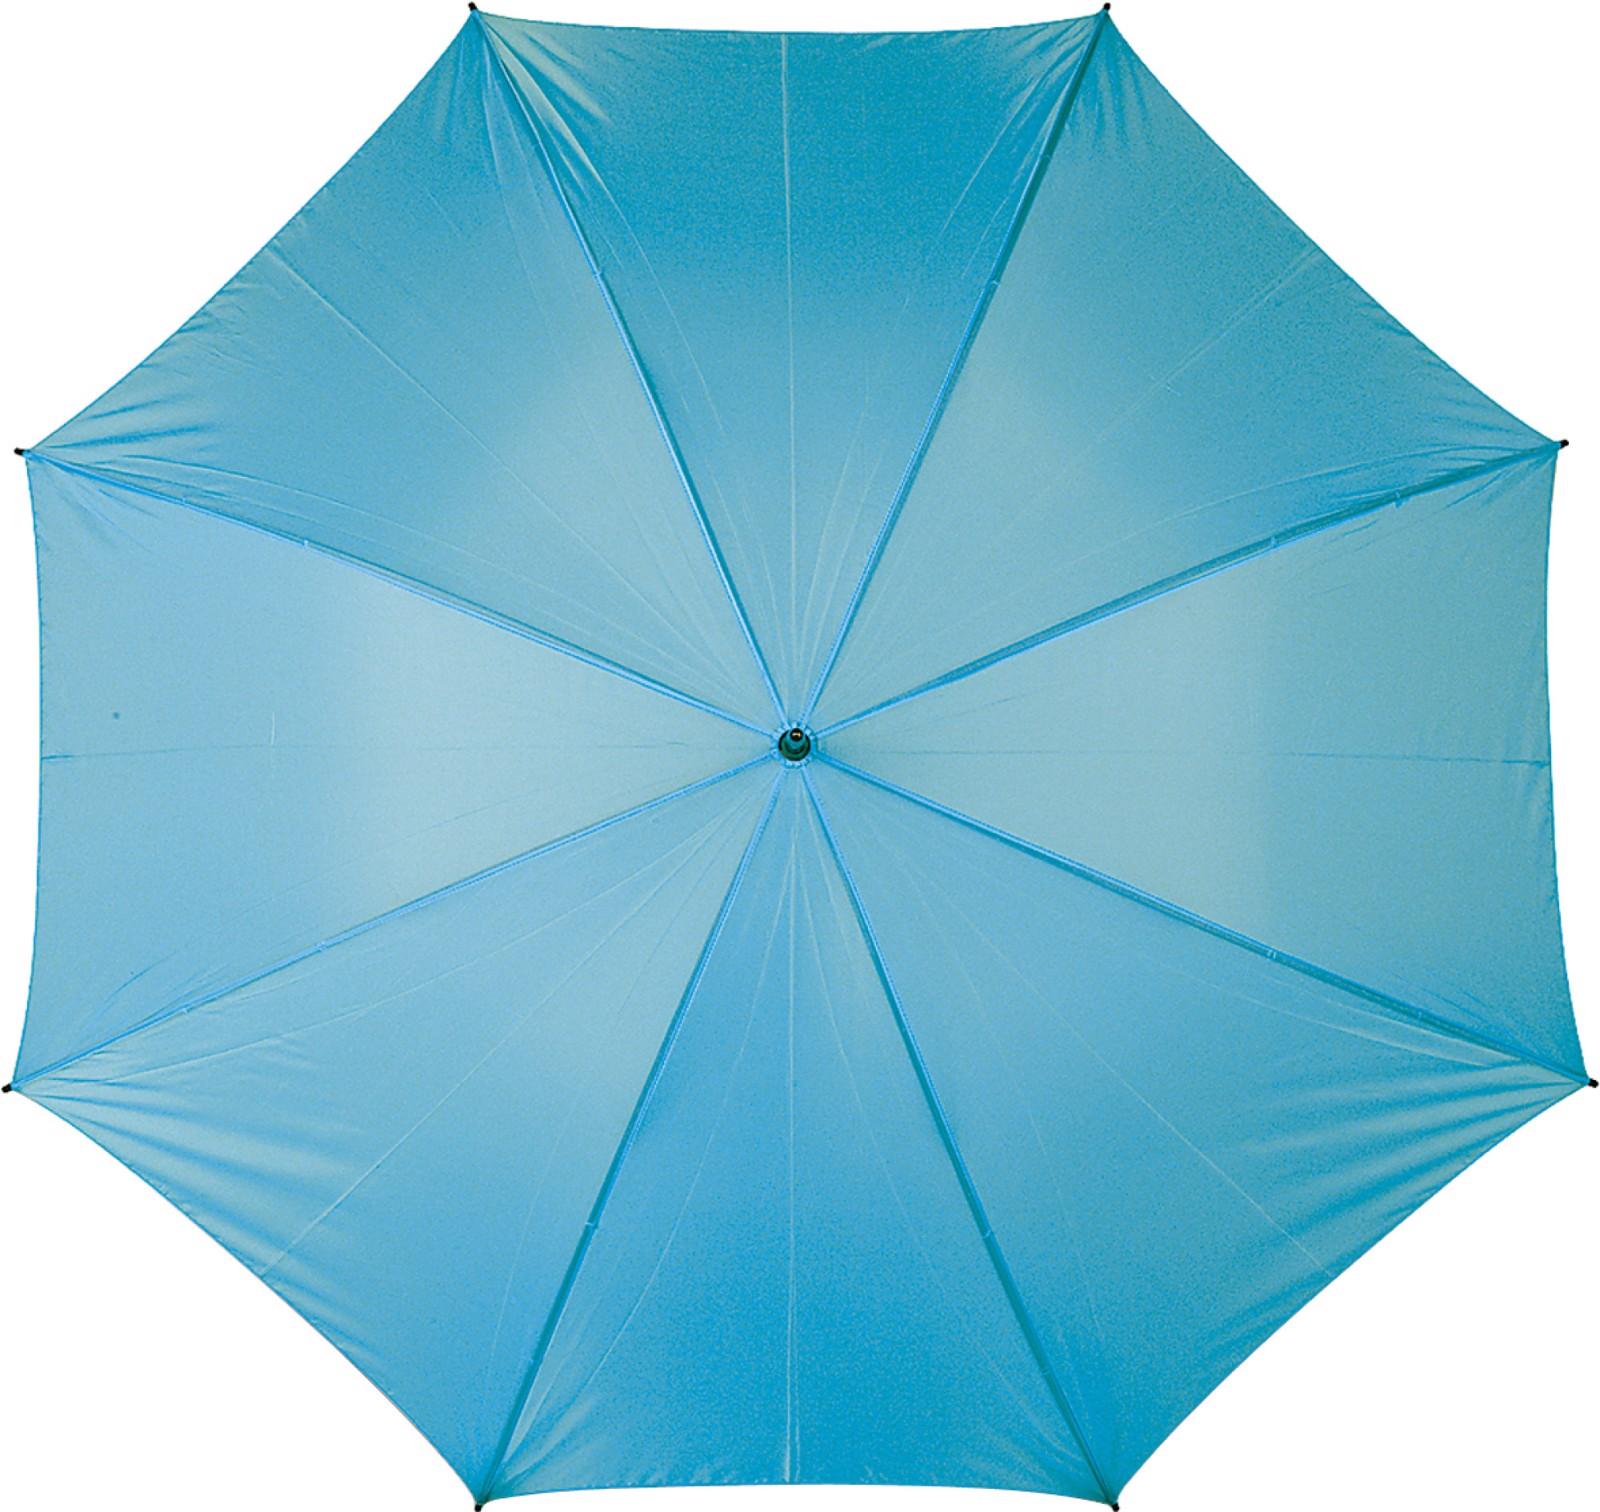 Polyester (210T) umbrella - Light Blue